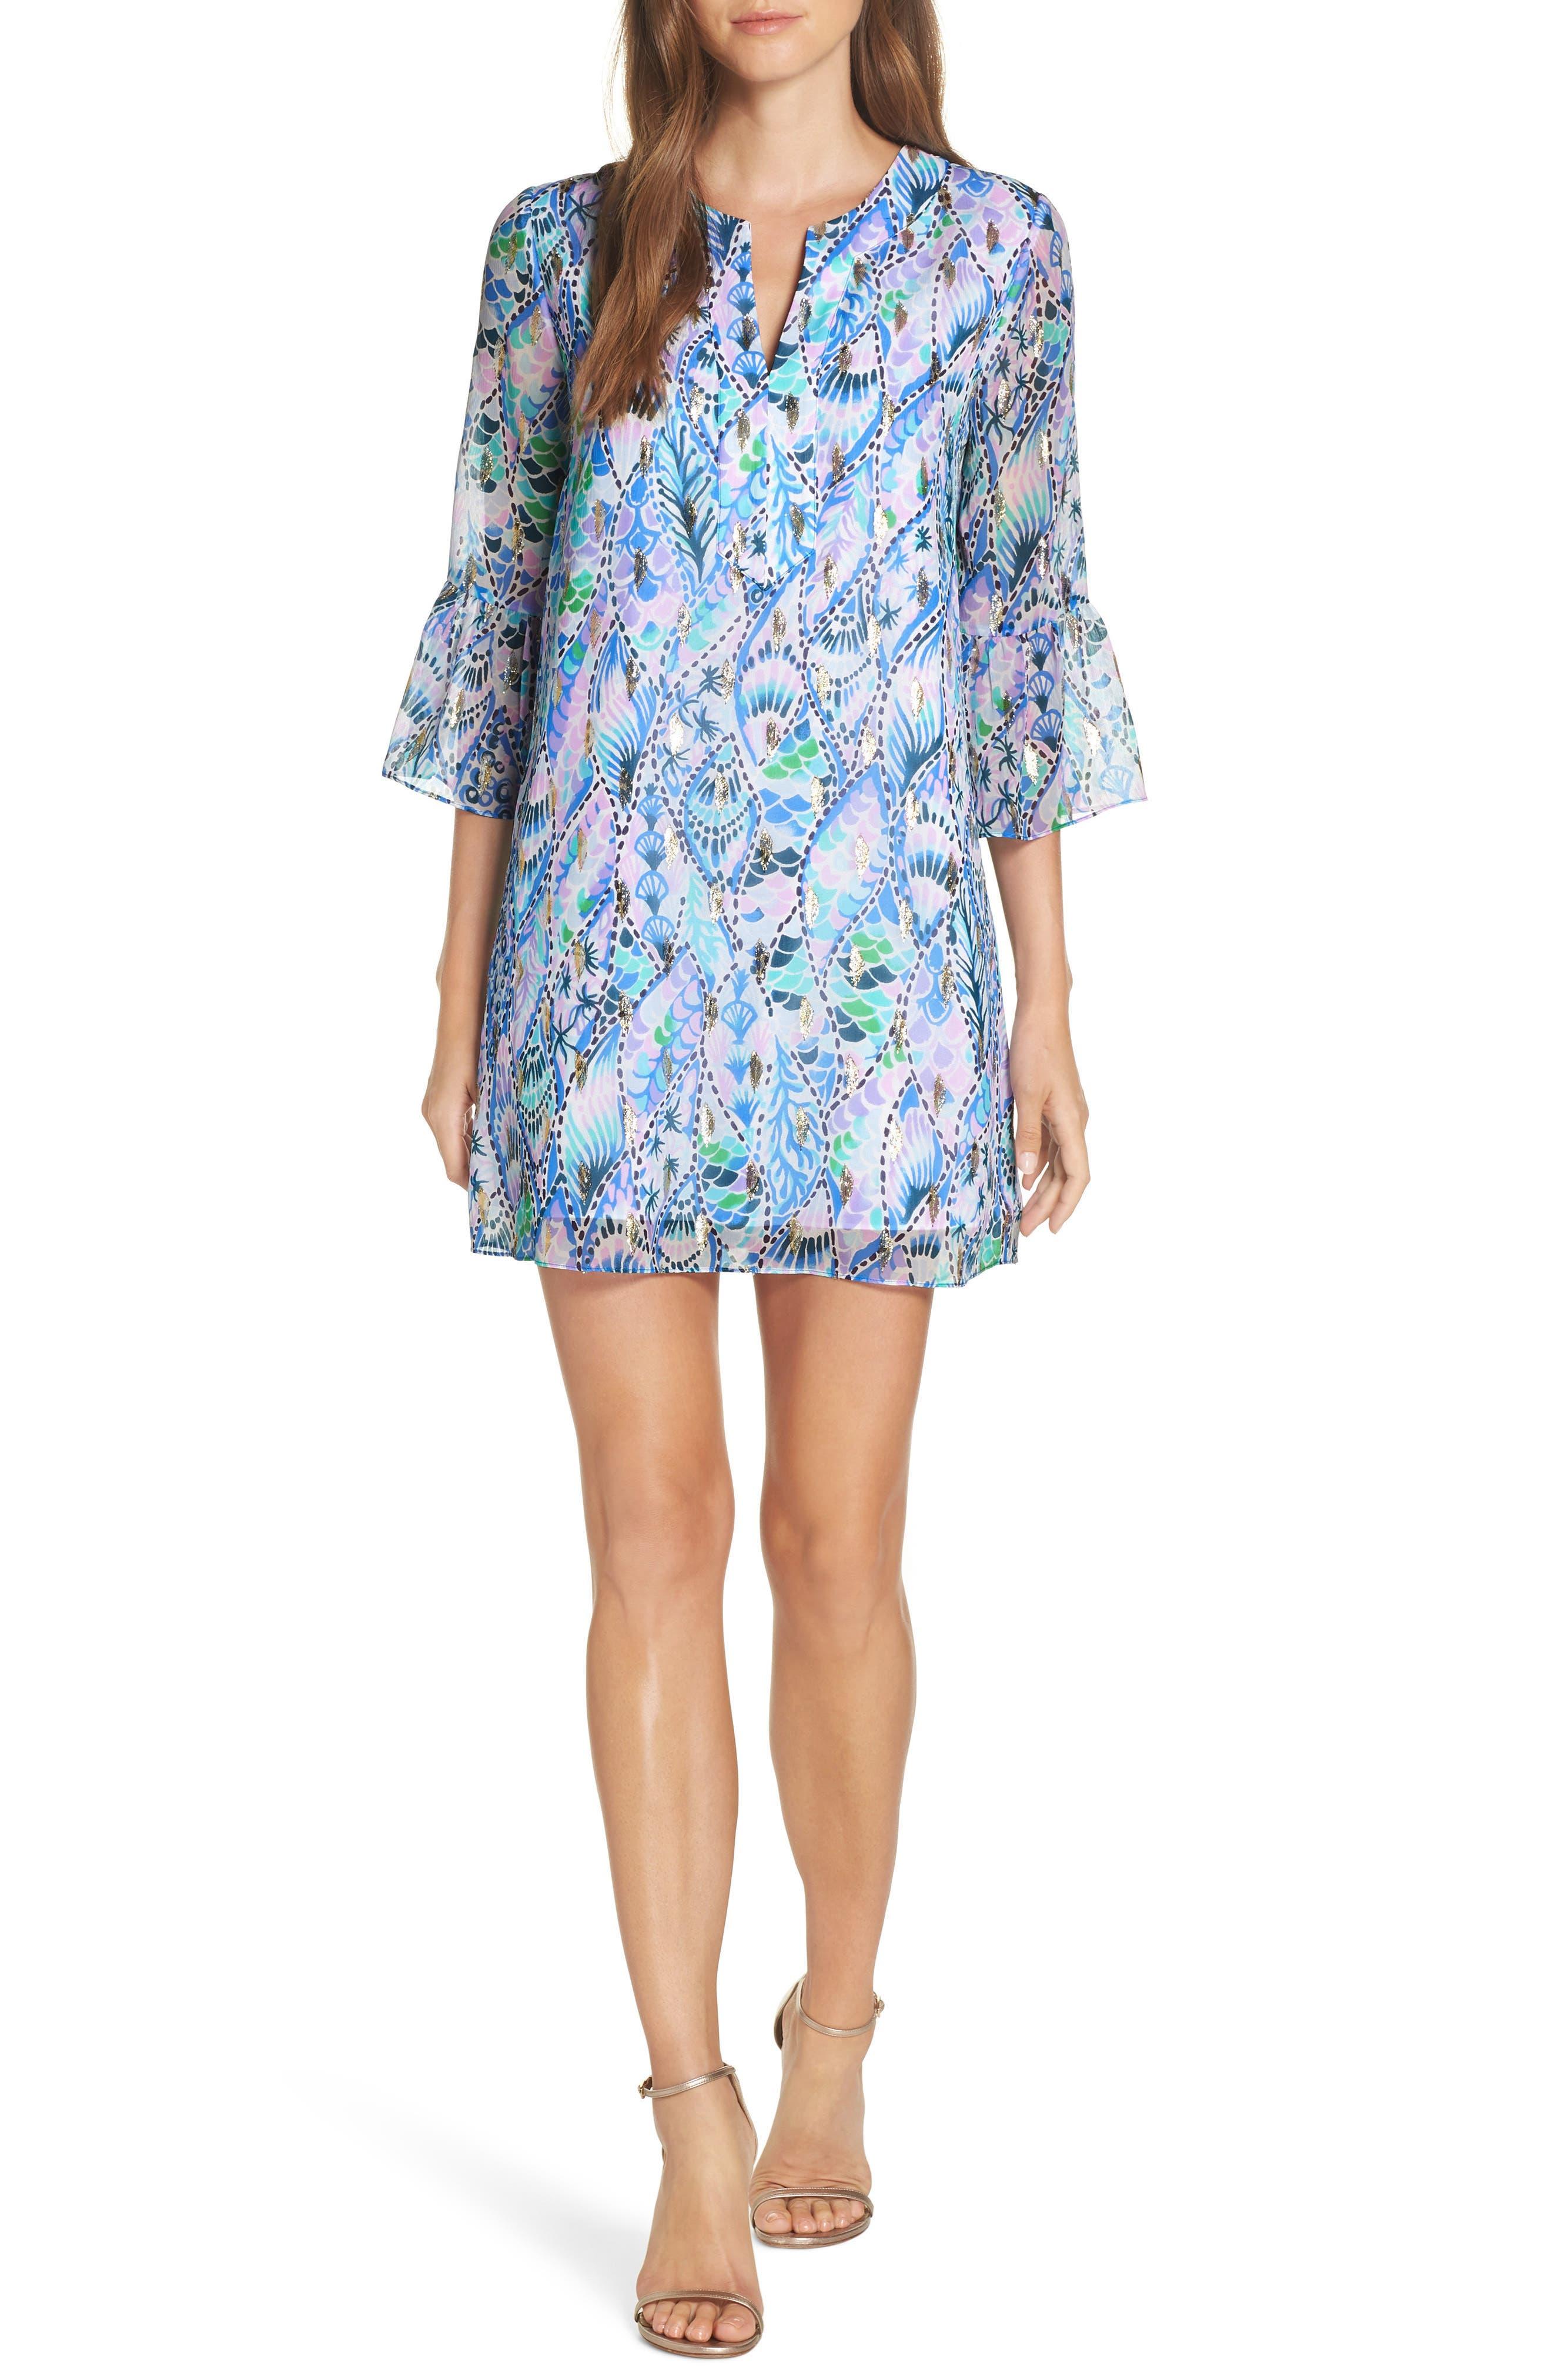 Lilly Pulitzer Elenora Silk Dress